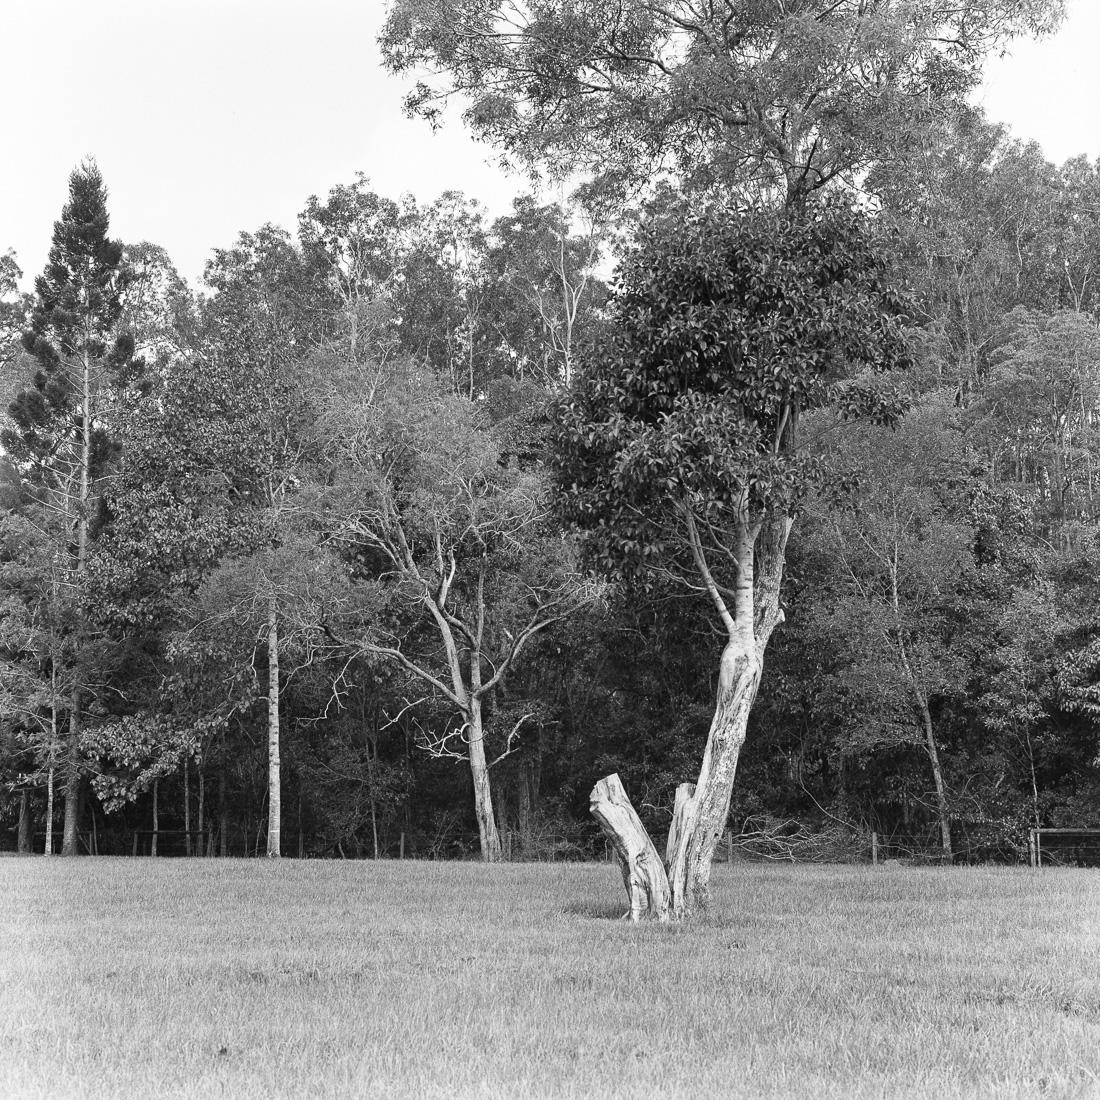 20190112 - Roll 270 - 004-Nick-Bedford,-Photographer-80mm F2.8, Black and White, Brisbane, Ilford HP5+, Medium Format, Rolleiflex 2.8D.jpg